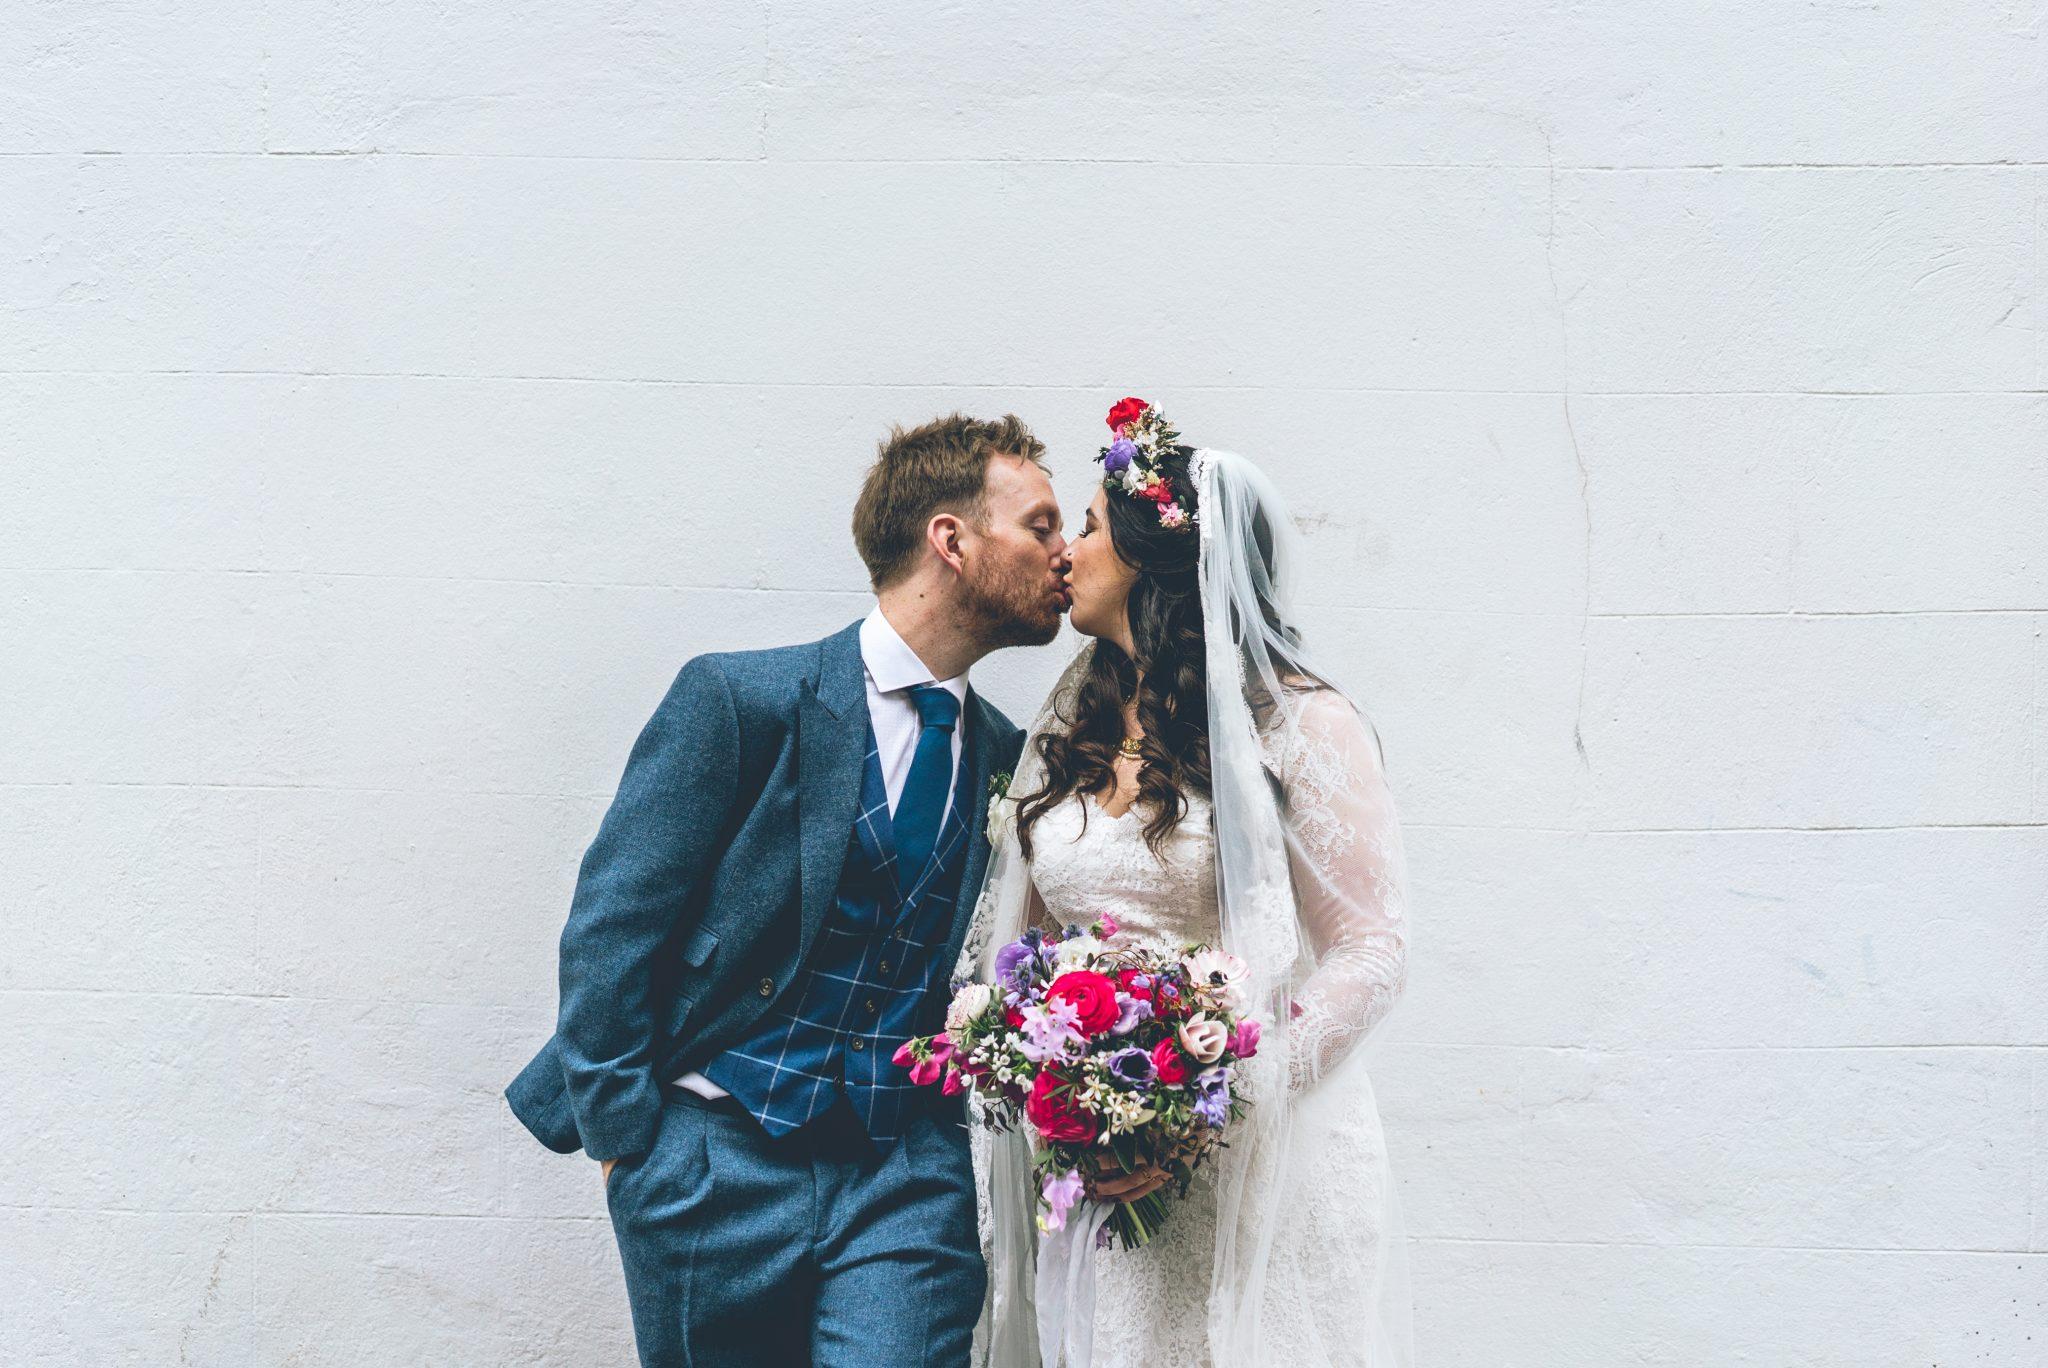 David hnyda wedding